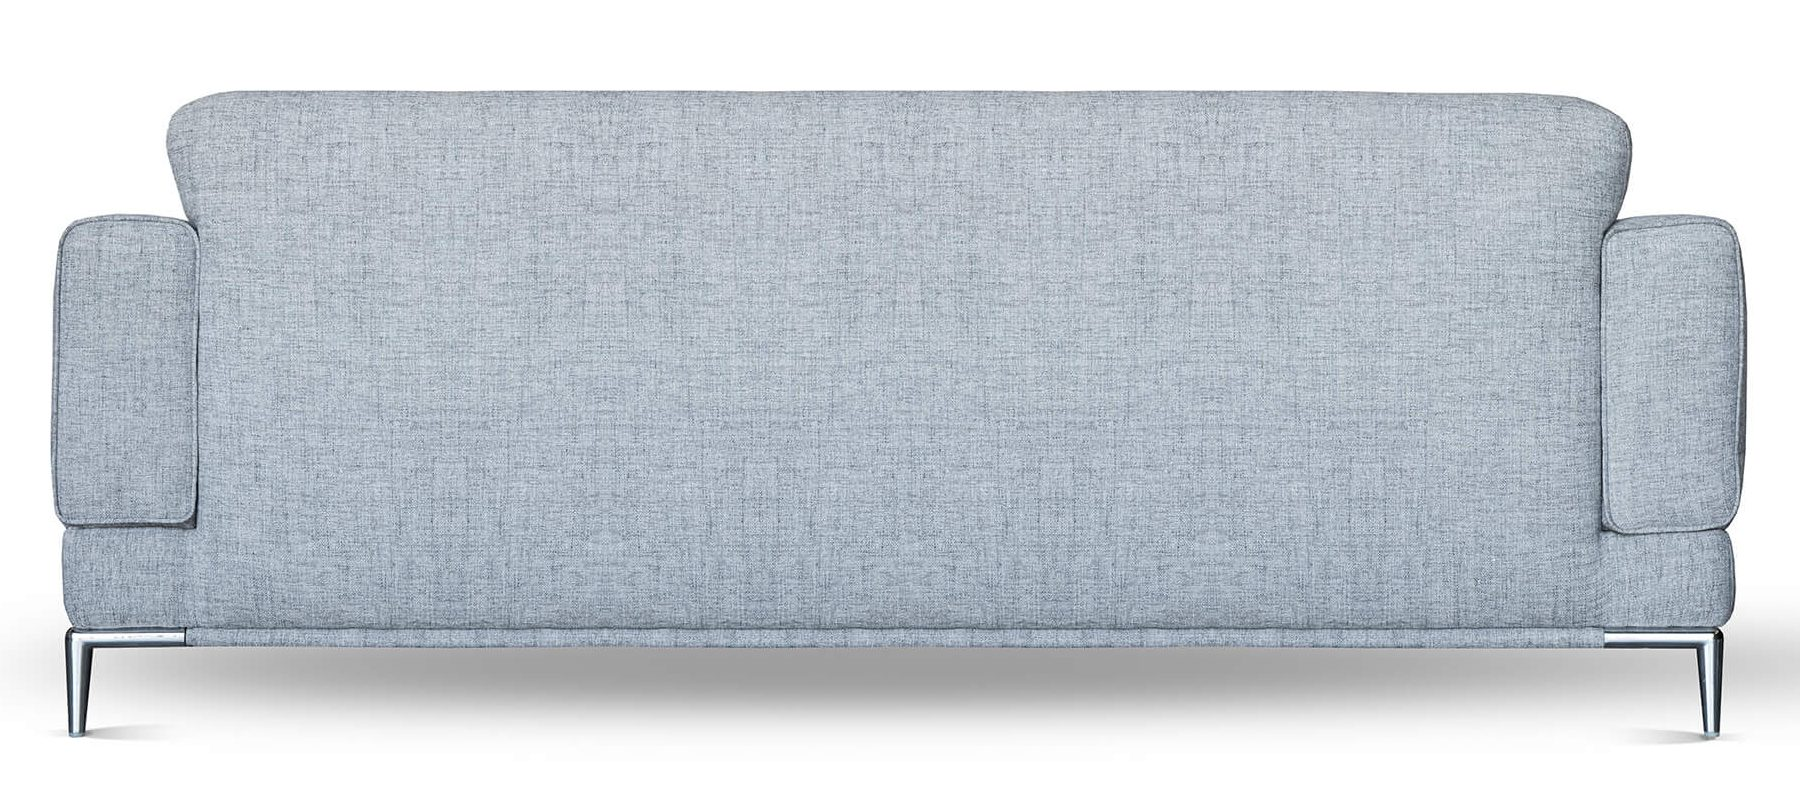 chilan397 e1588414731402 - ست مبل مدرن پایه فلزی تولیکا مدل چیلان - - living-room-sets